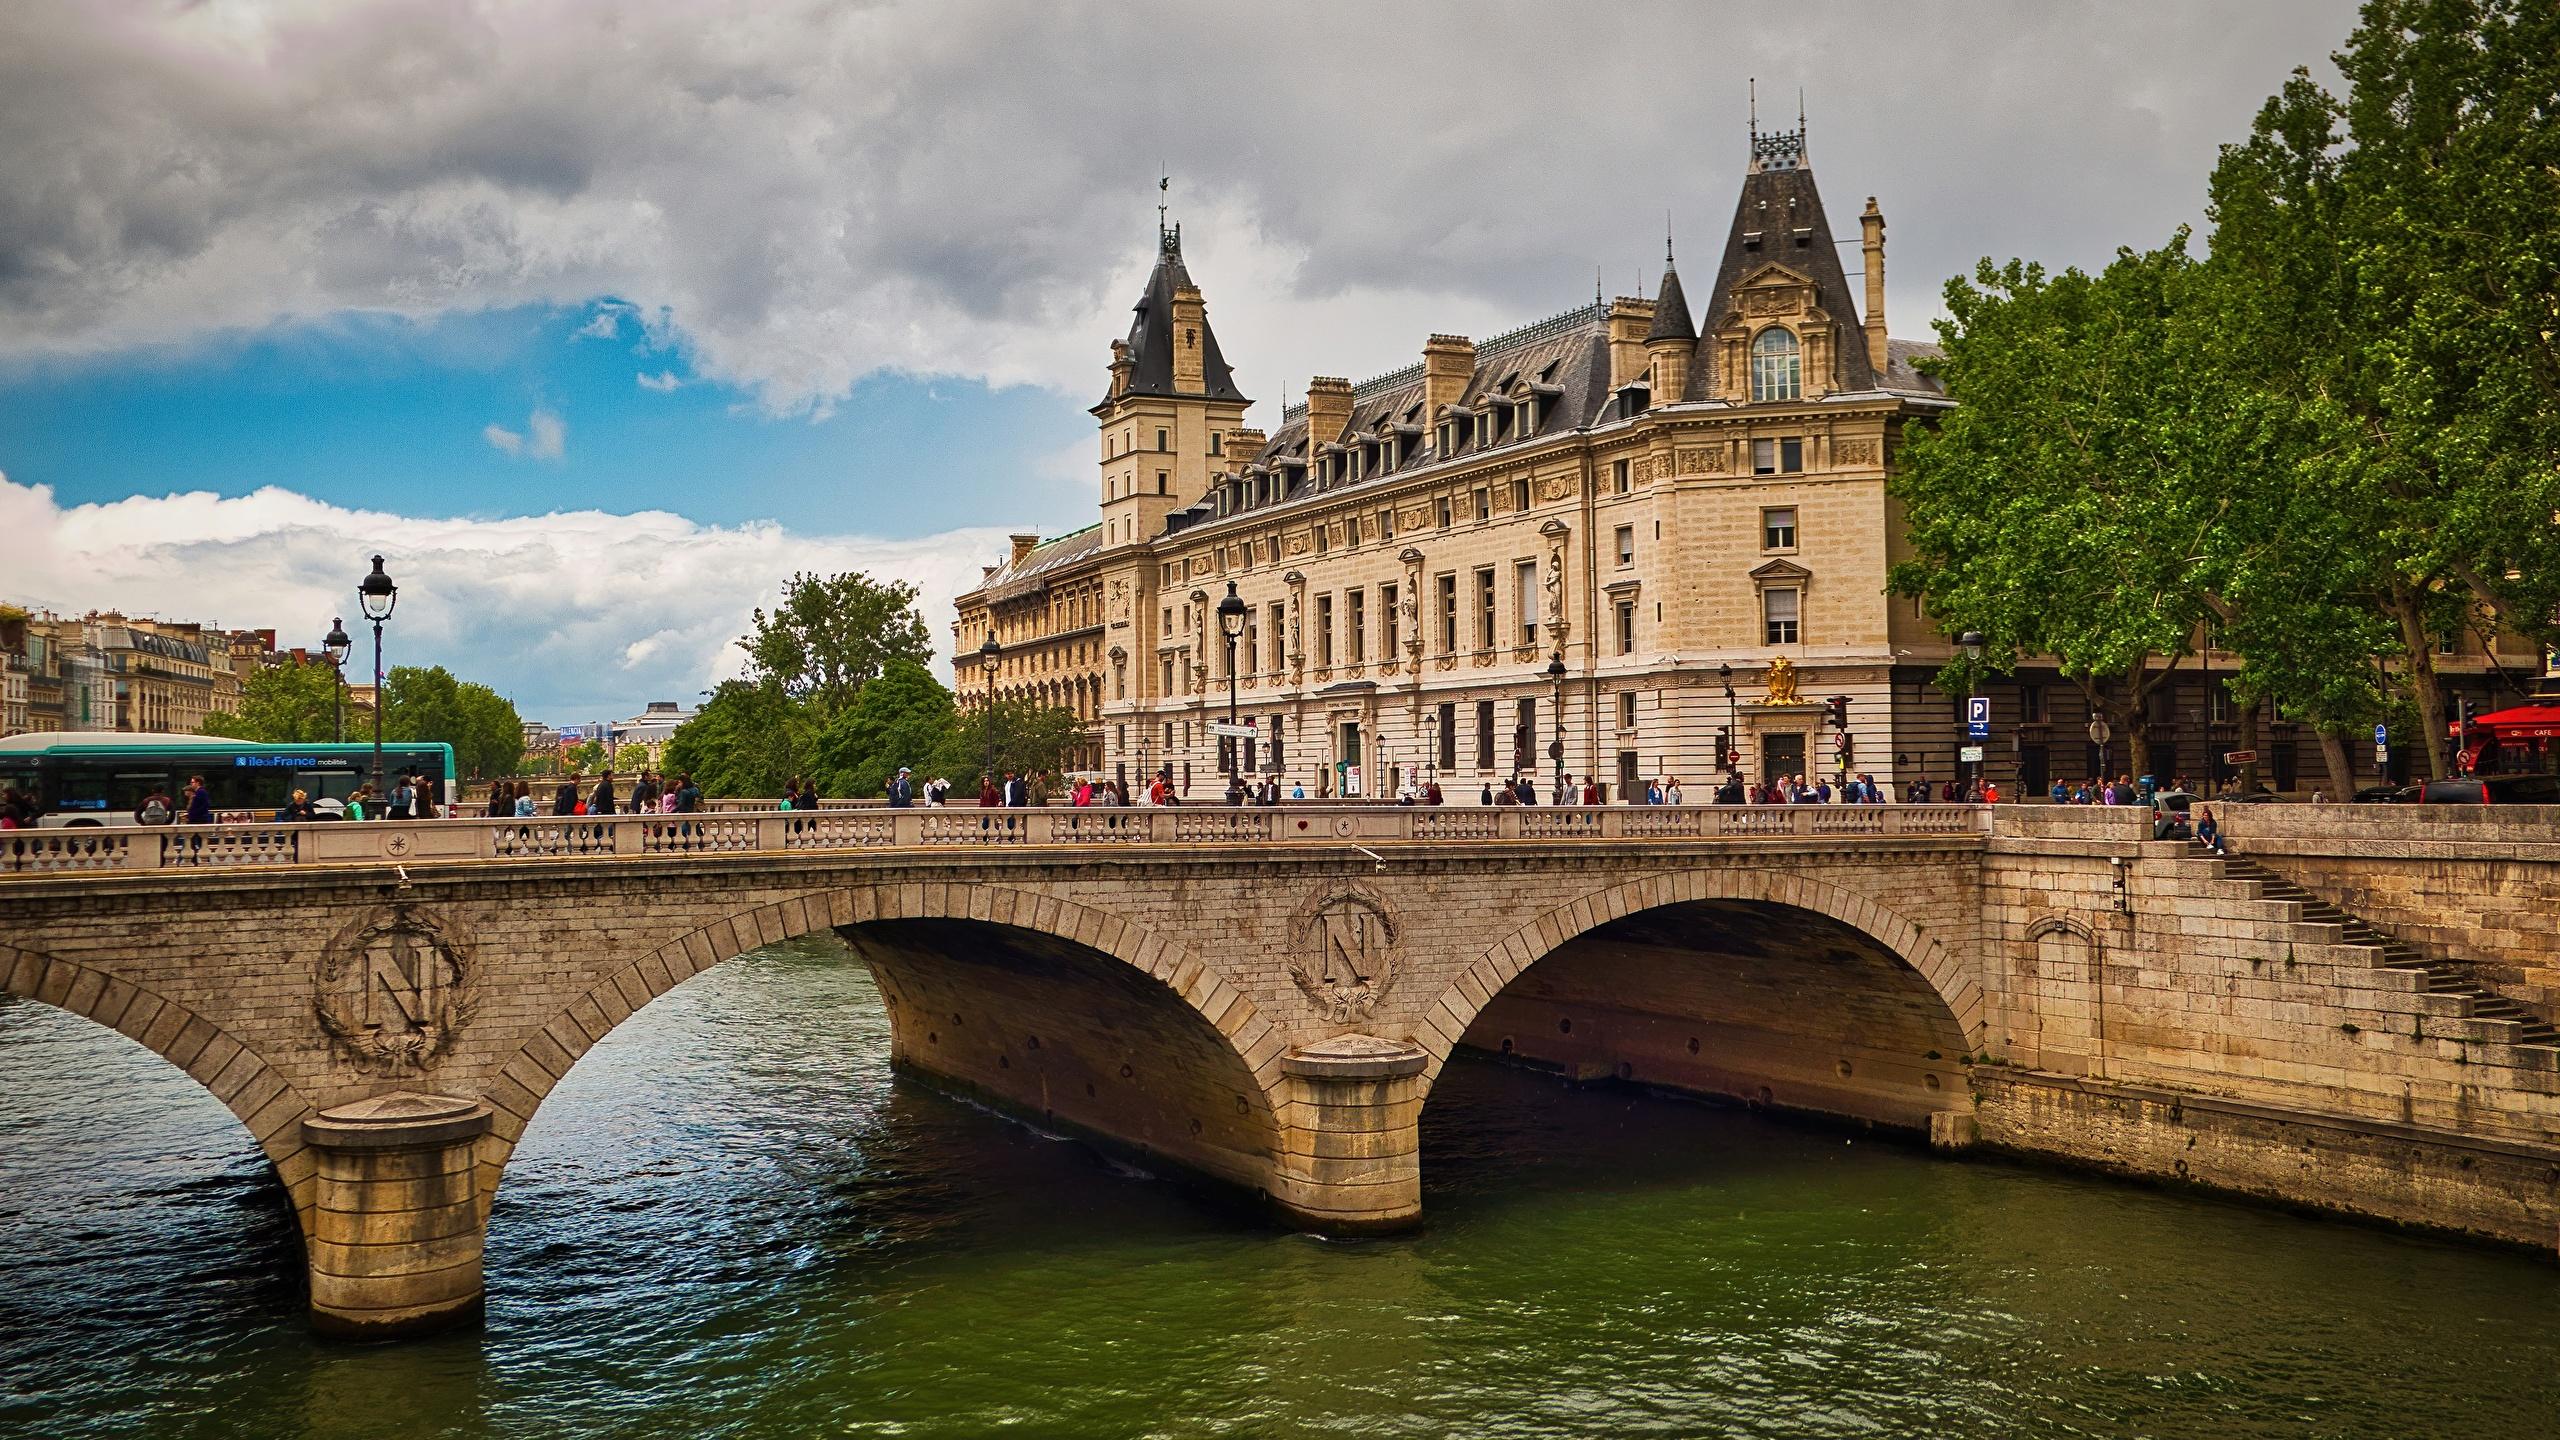 Foton Paris Frankrike Pont Saint Michel Bro Floder Stader 2560x1440